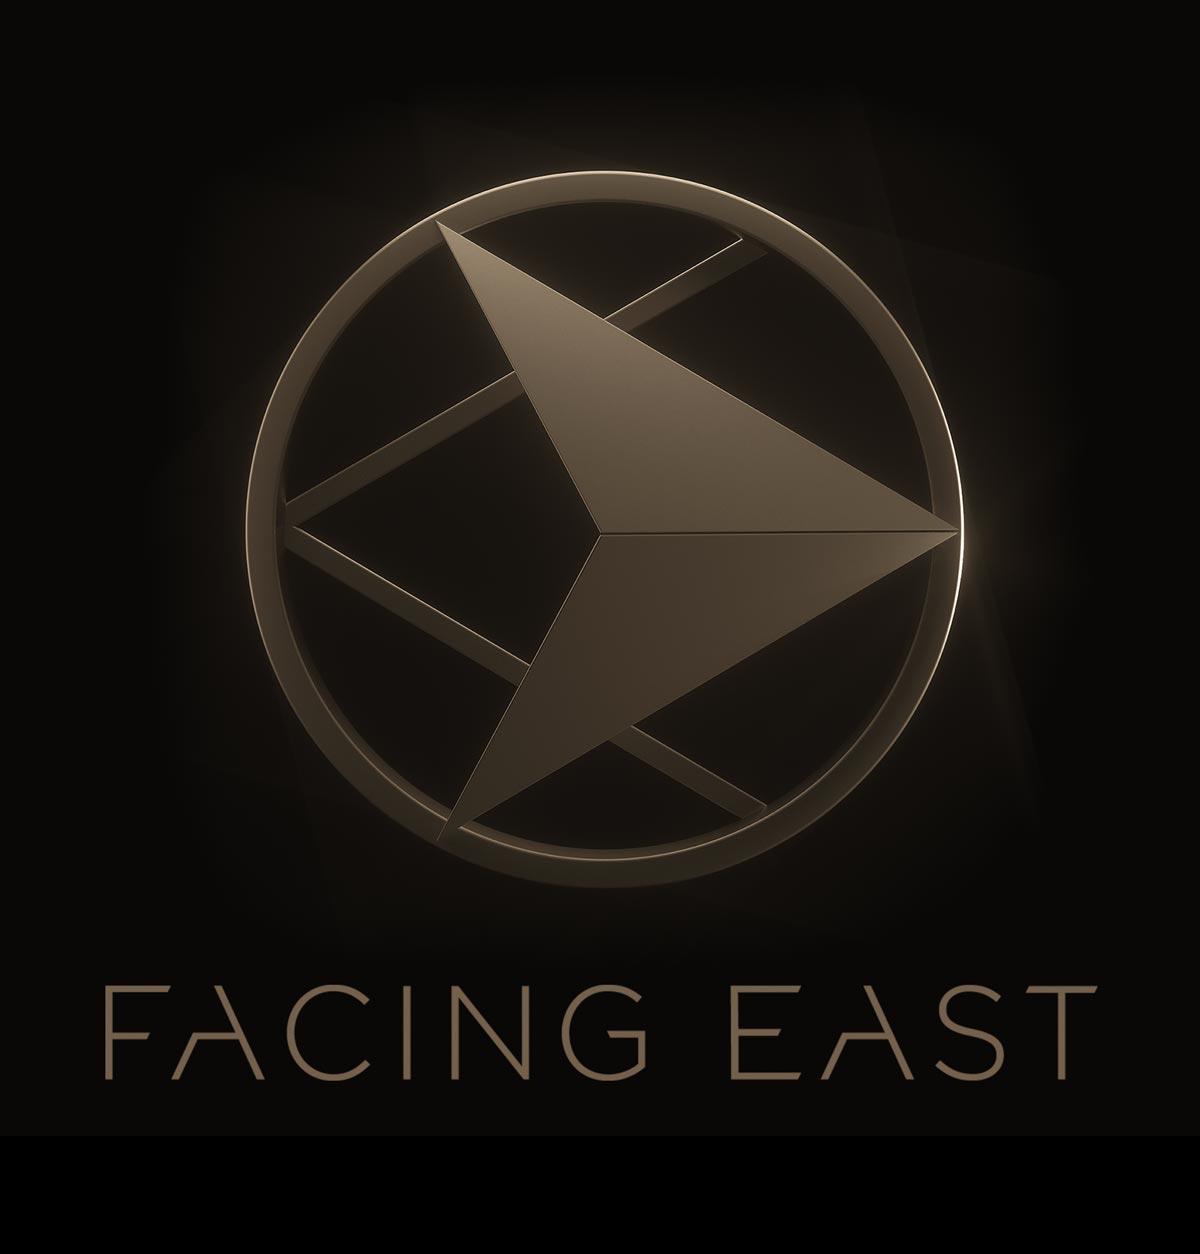 Logo development / Branding / Facing East